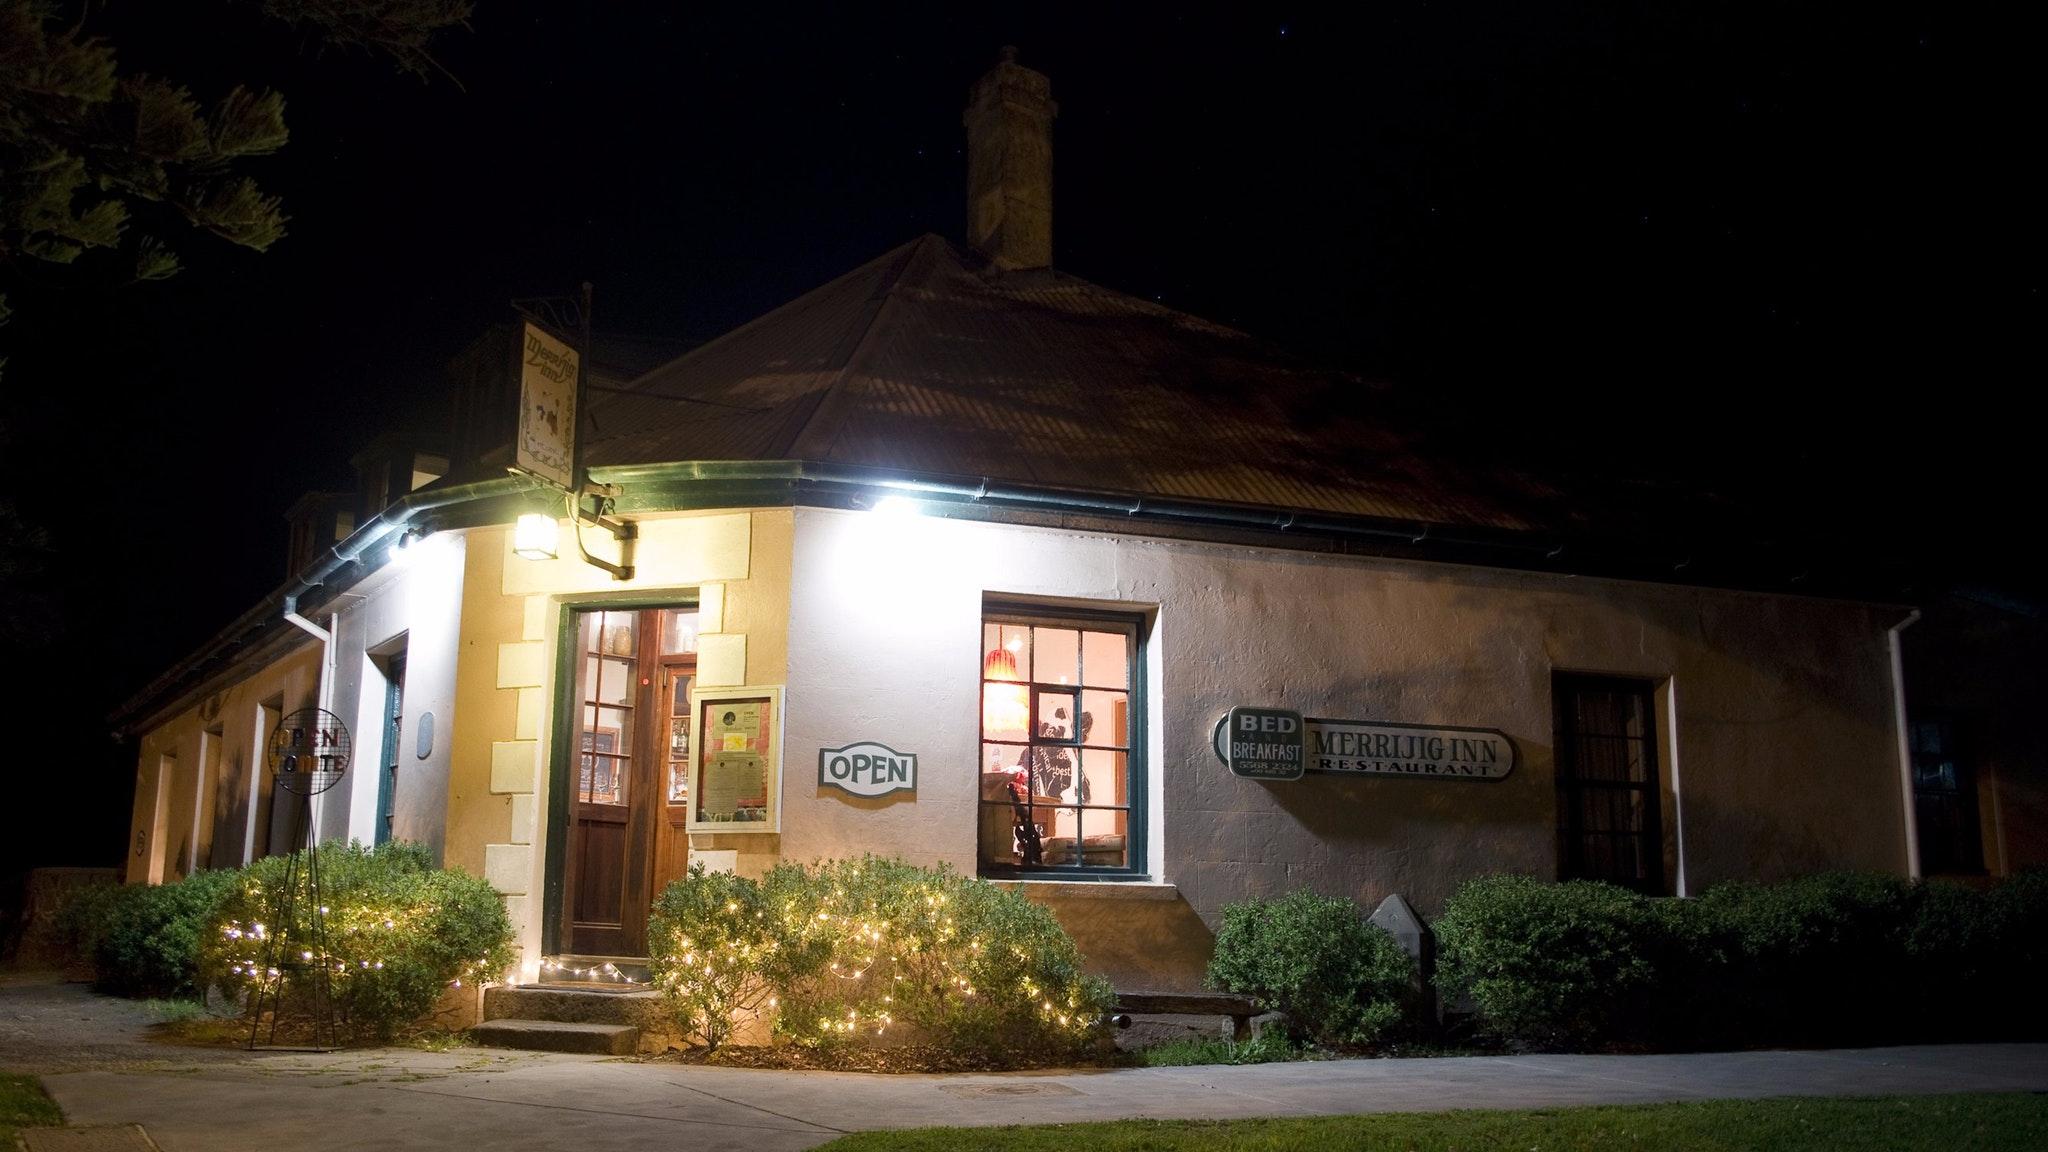 Merrijig inn at night